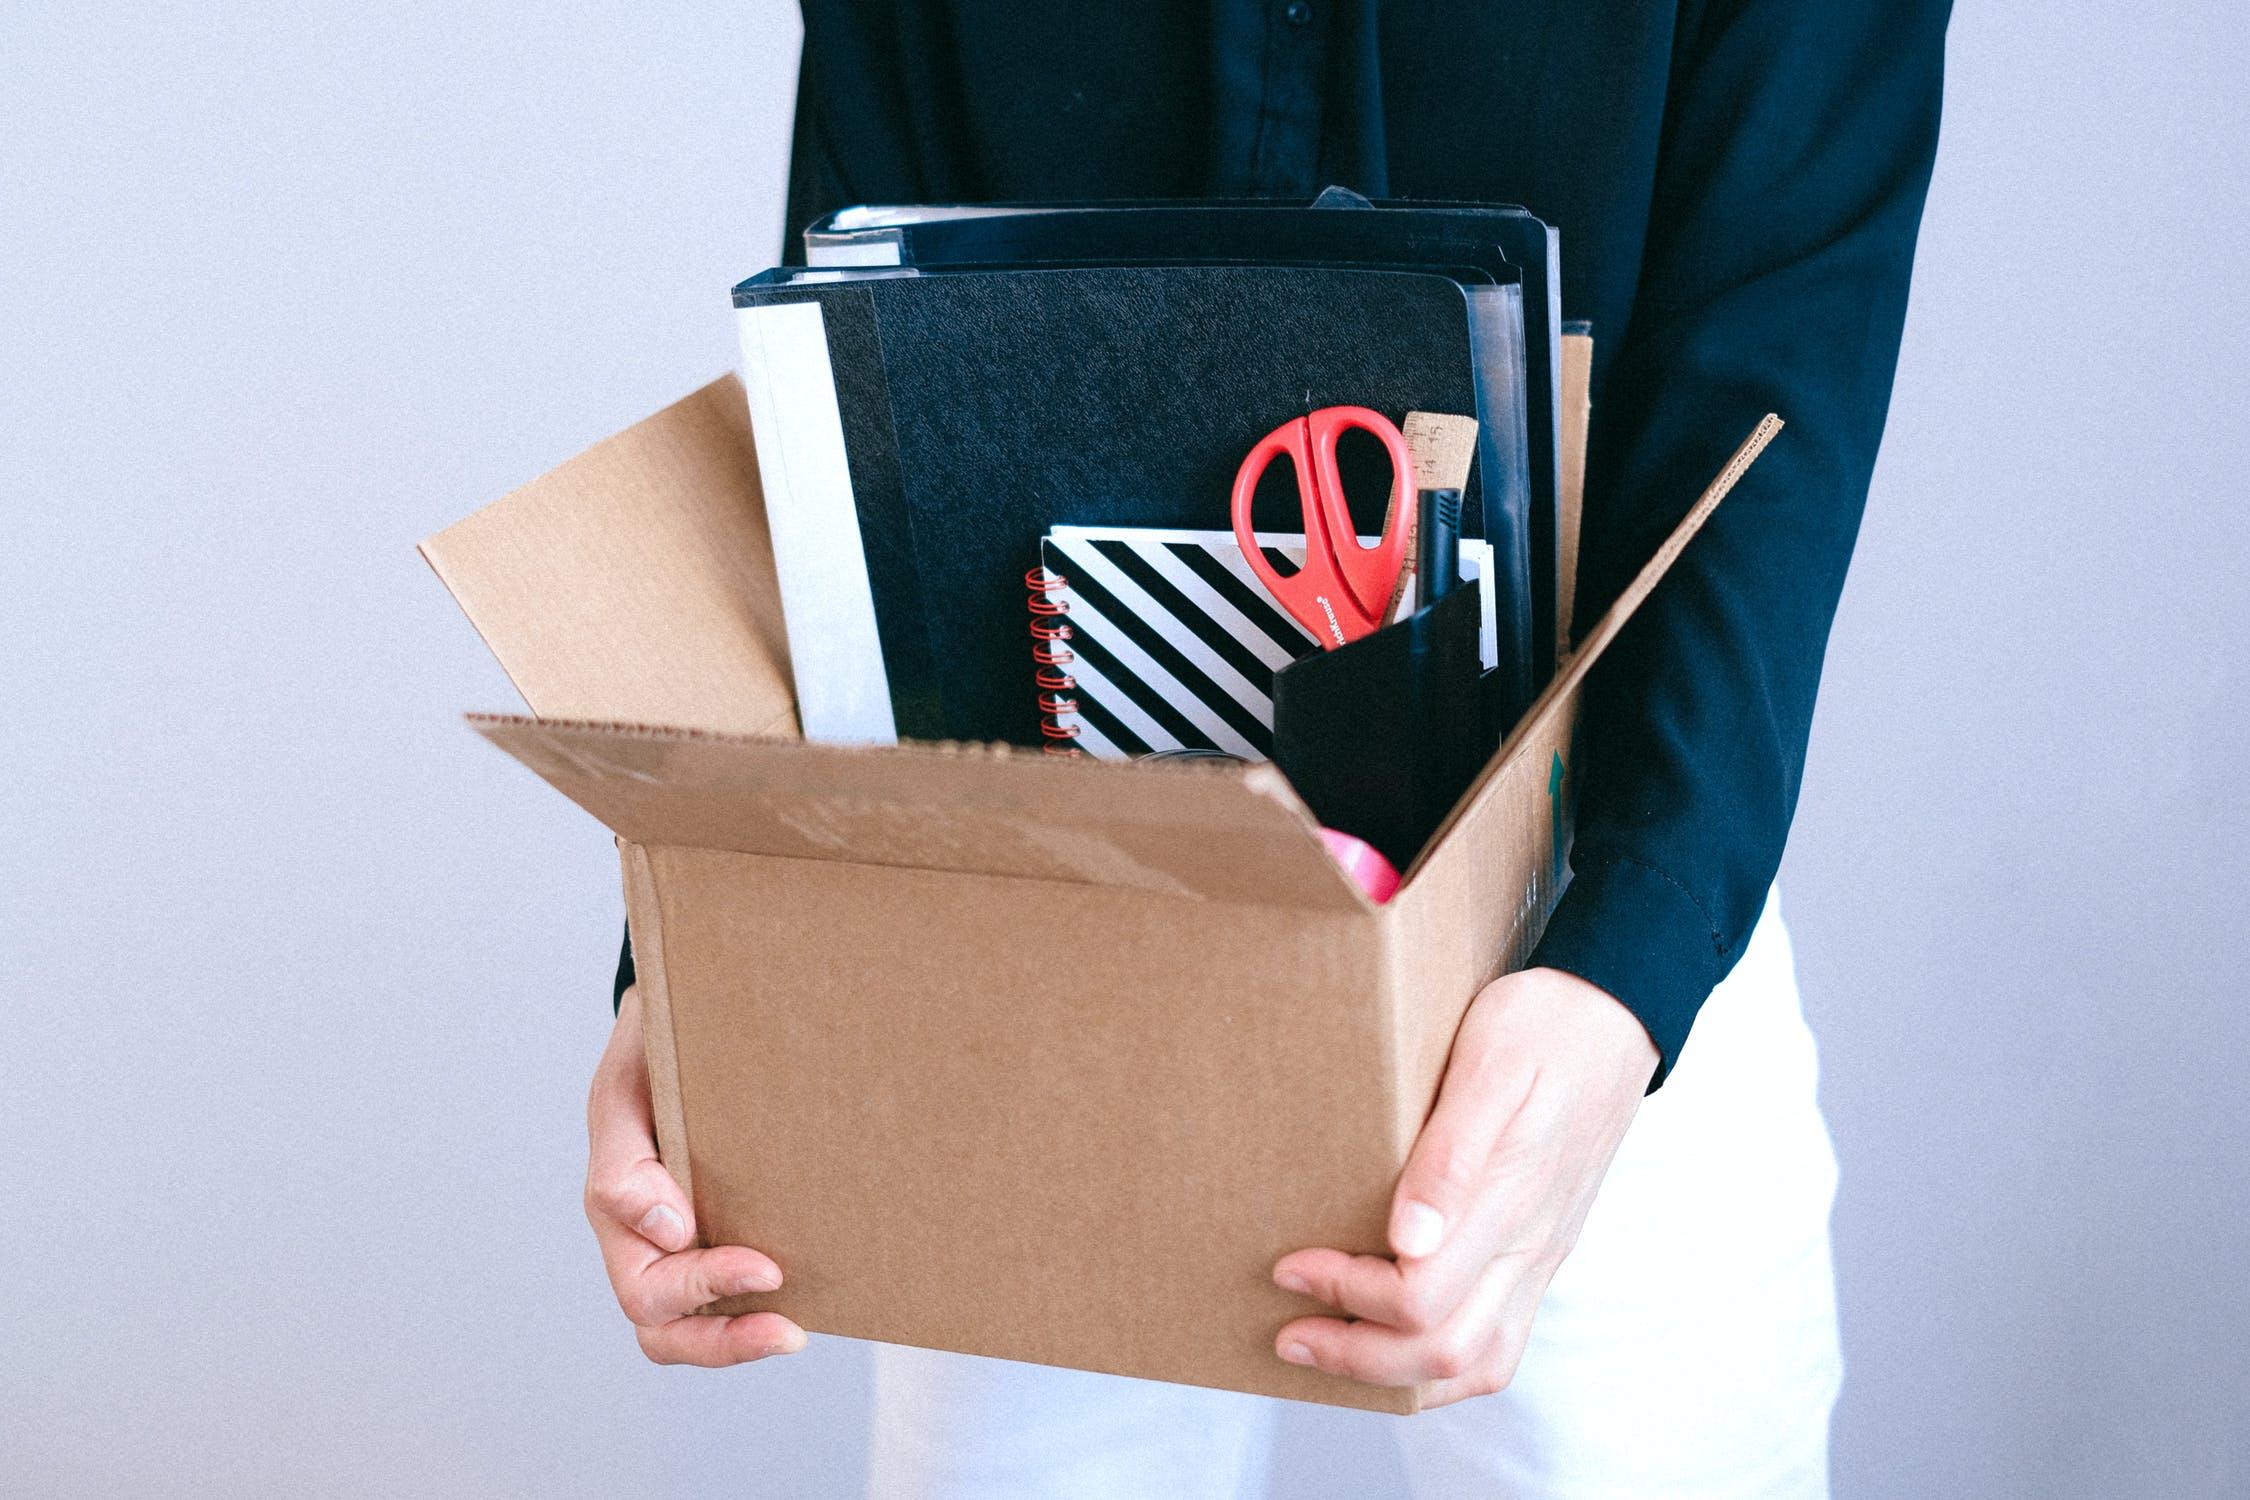 Leaving employee giving back company property